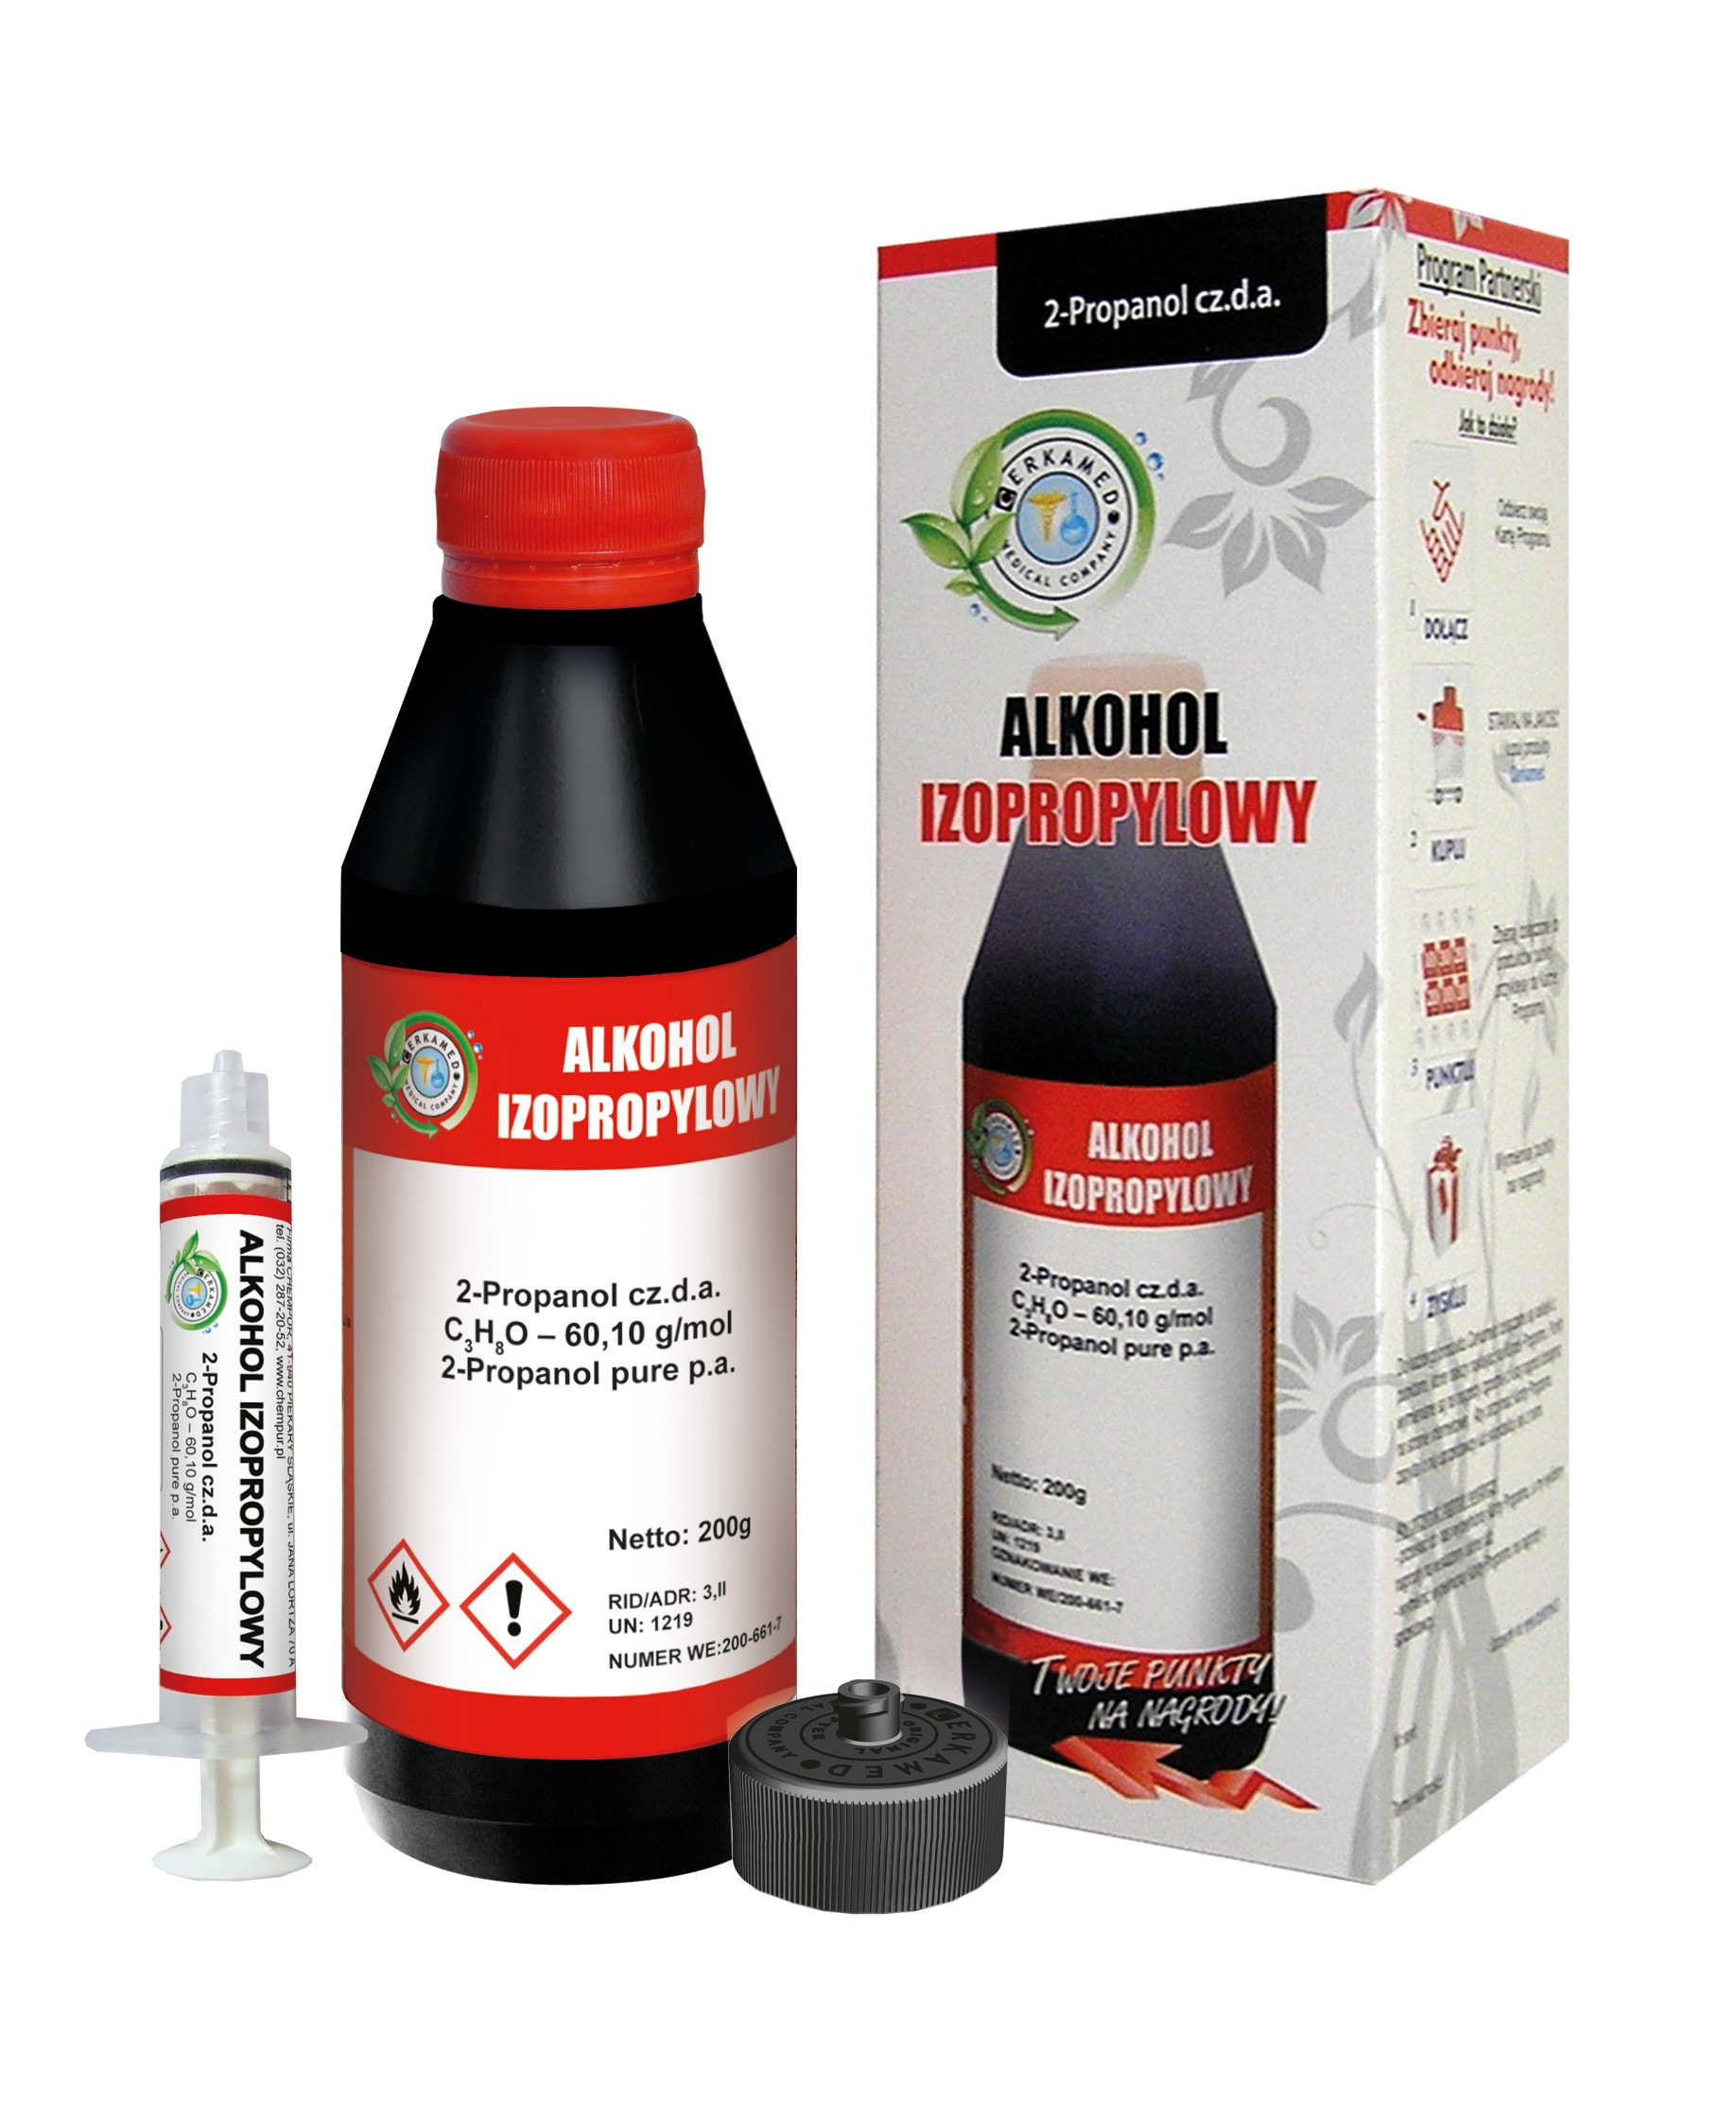 alkohol izopropylowy cerkamed